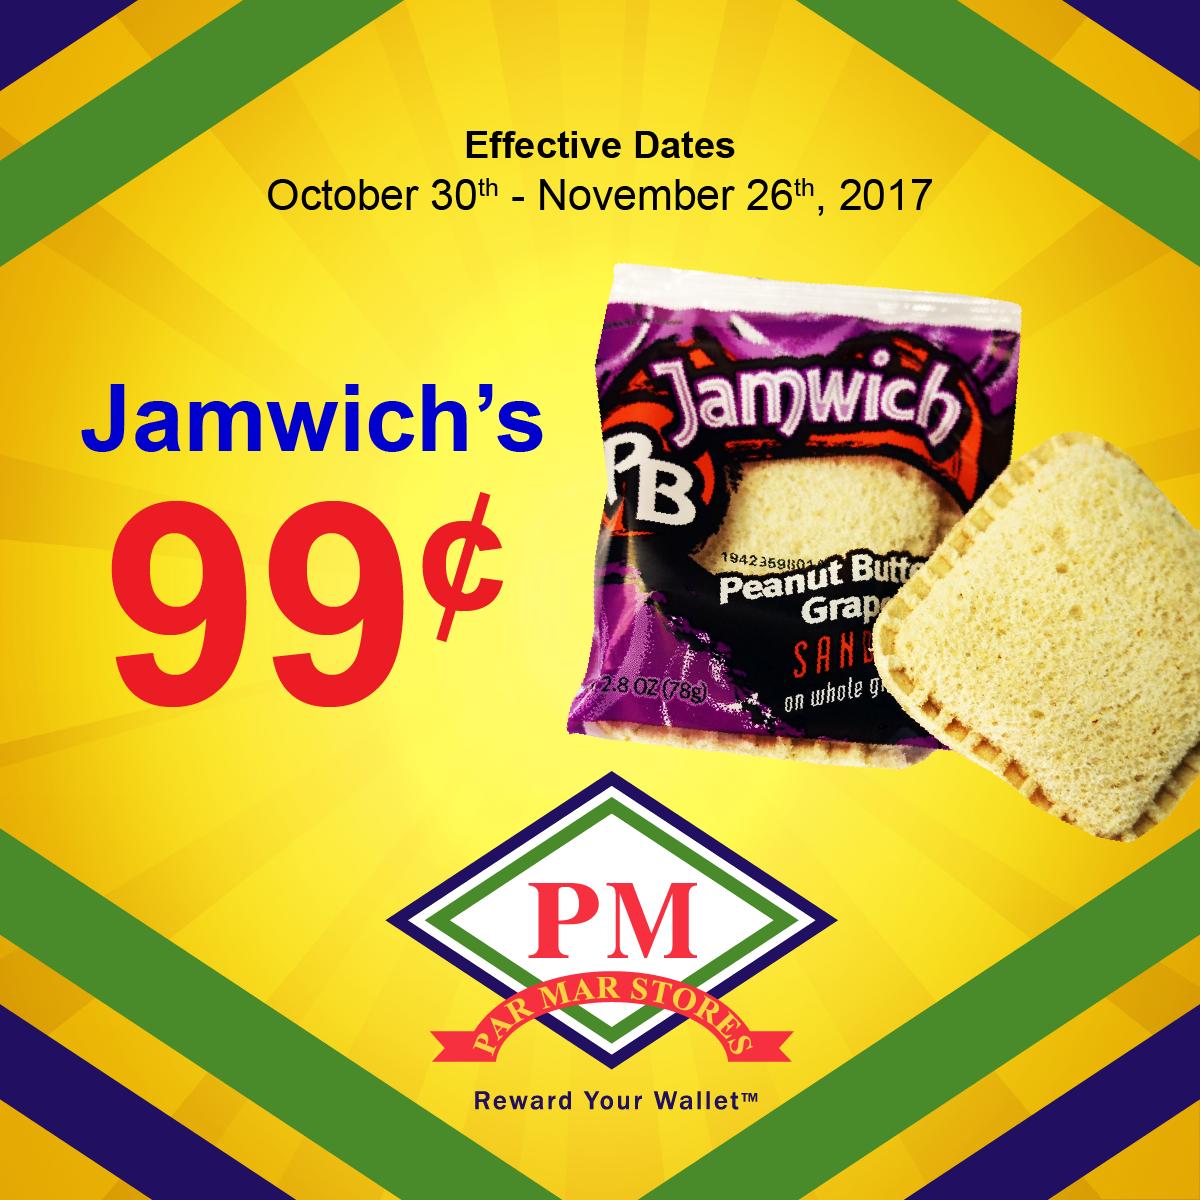 Jamwich